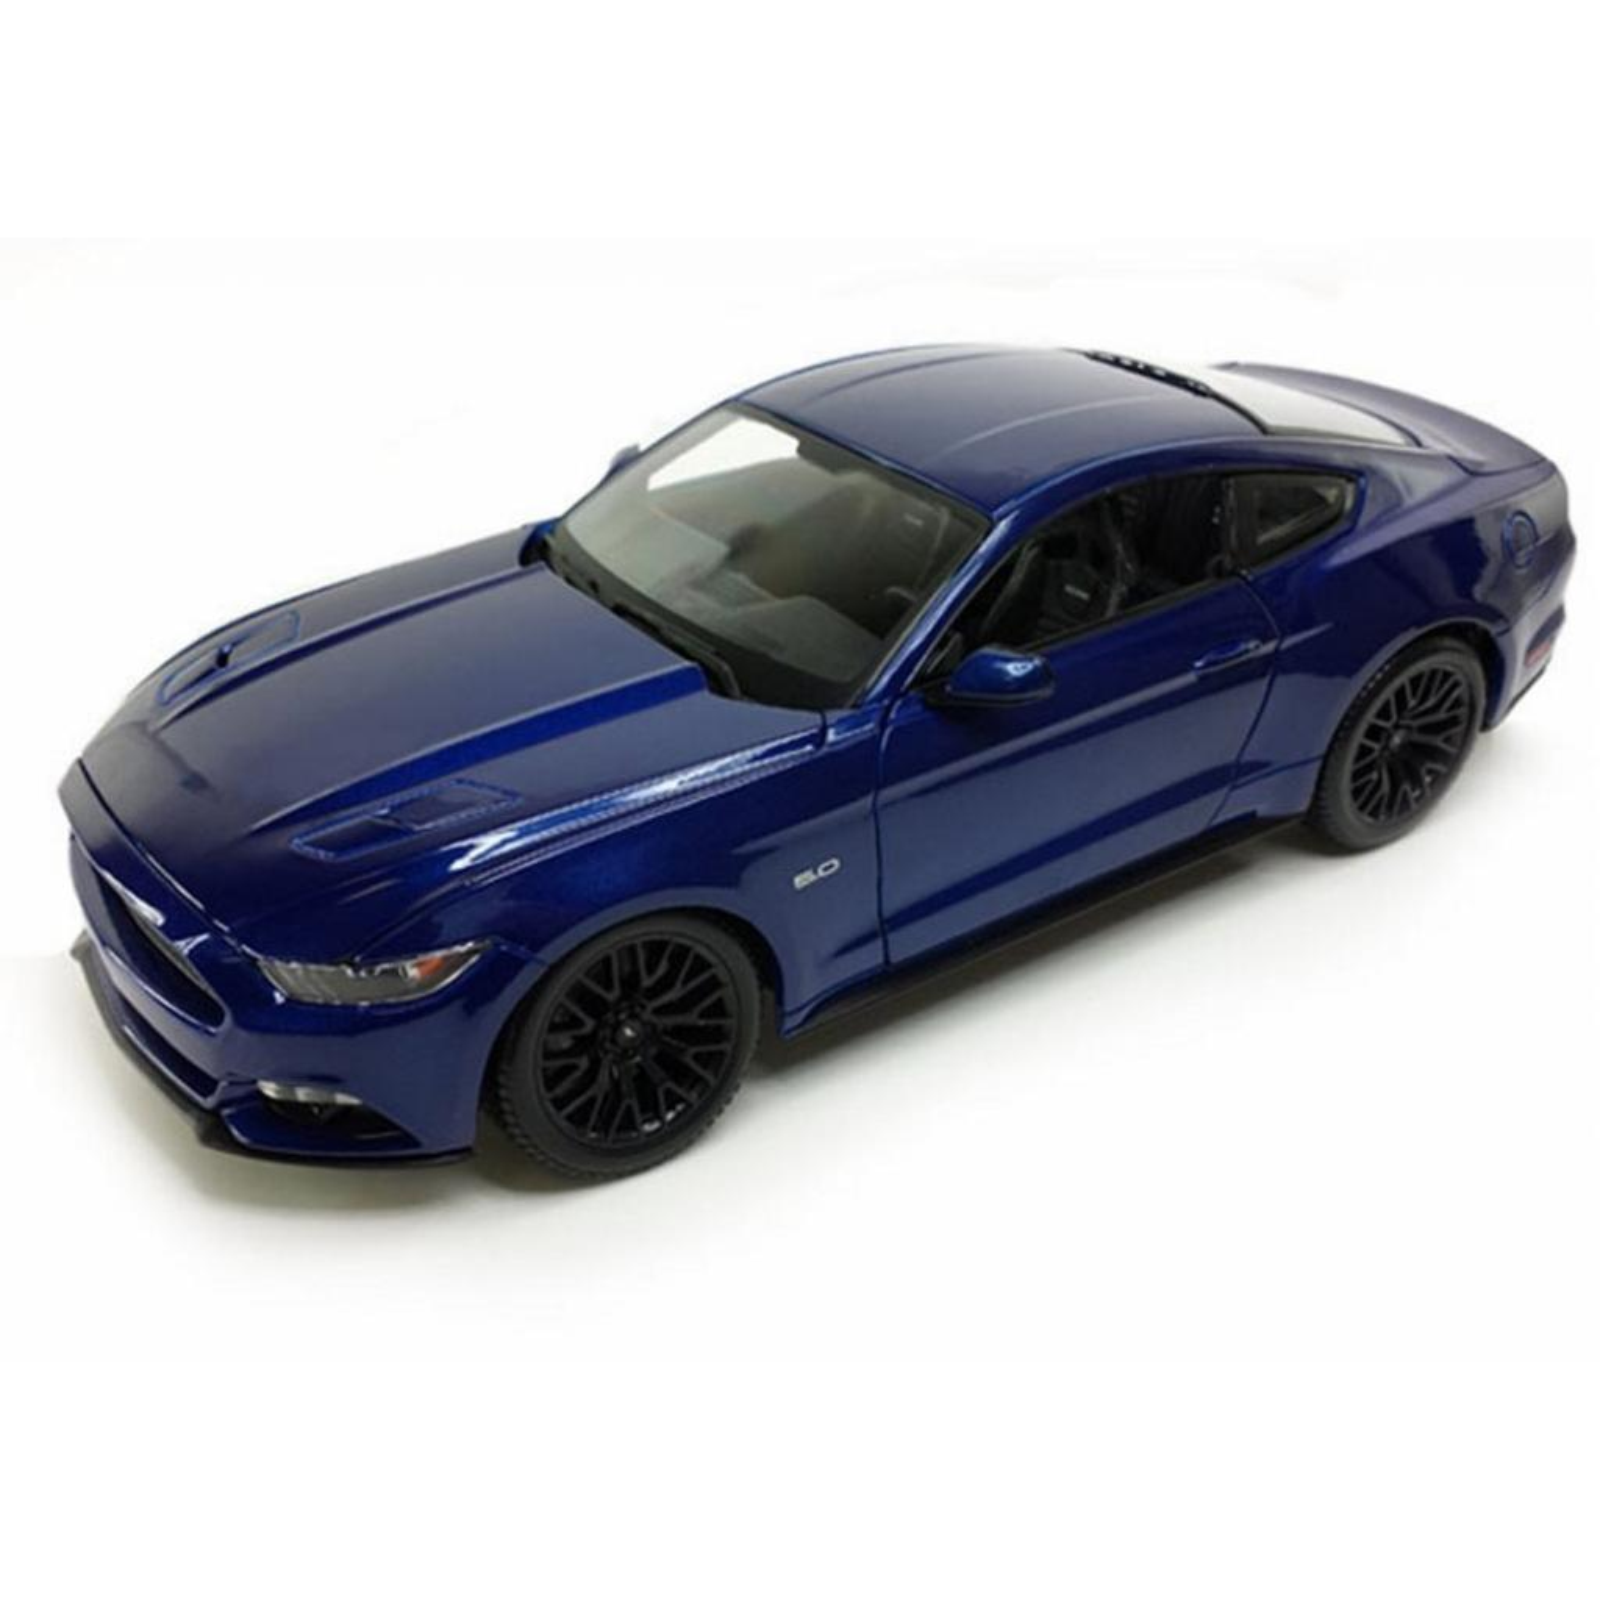 Машина Maisto Ford Mustang GT 2015 (1:24) синий (31508 blue)